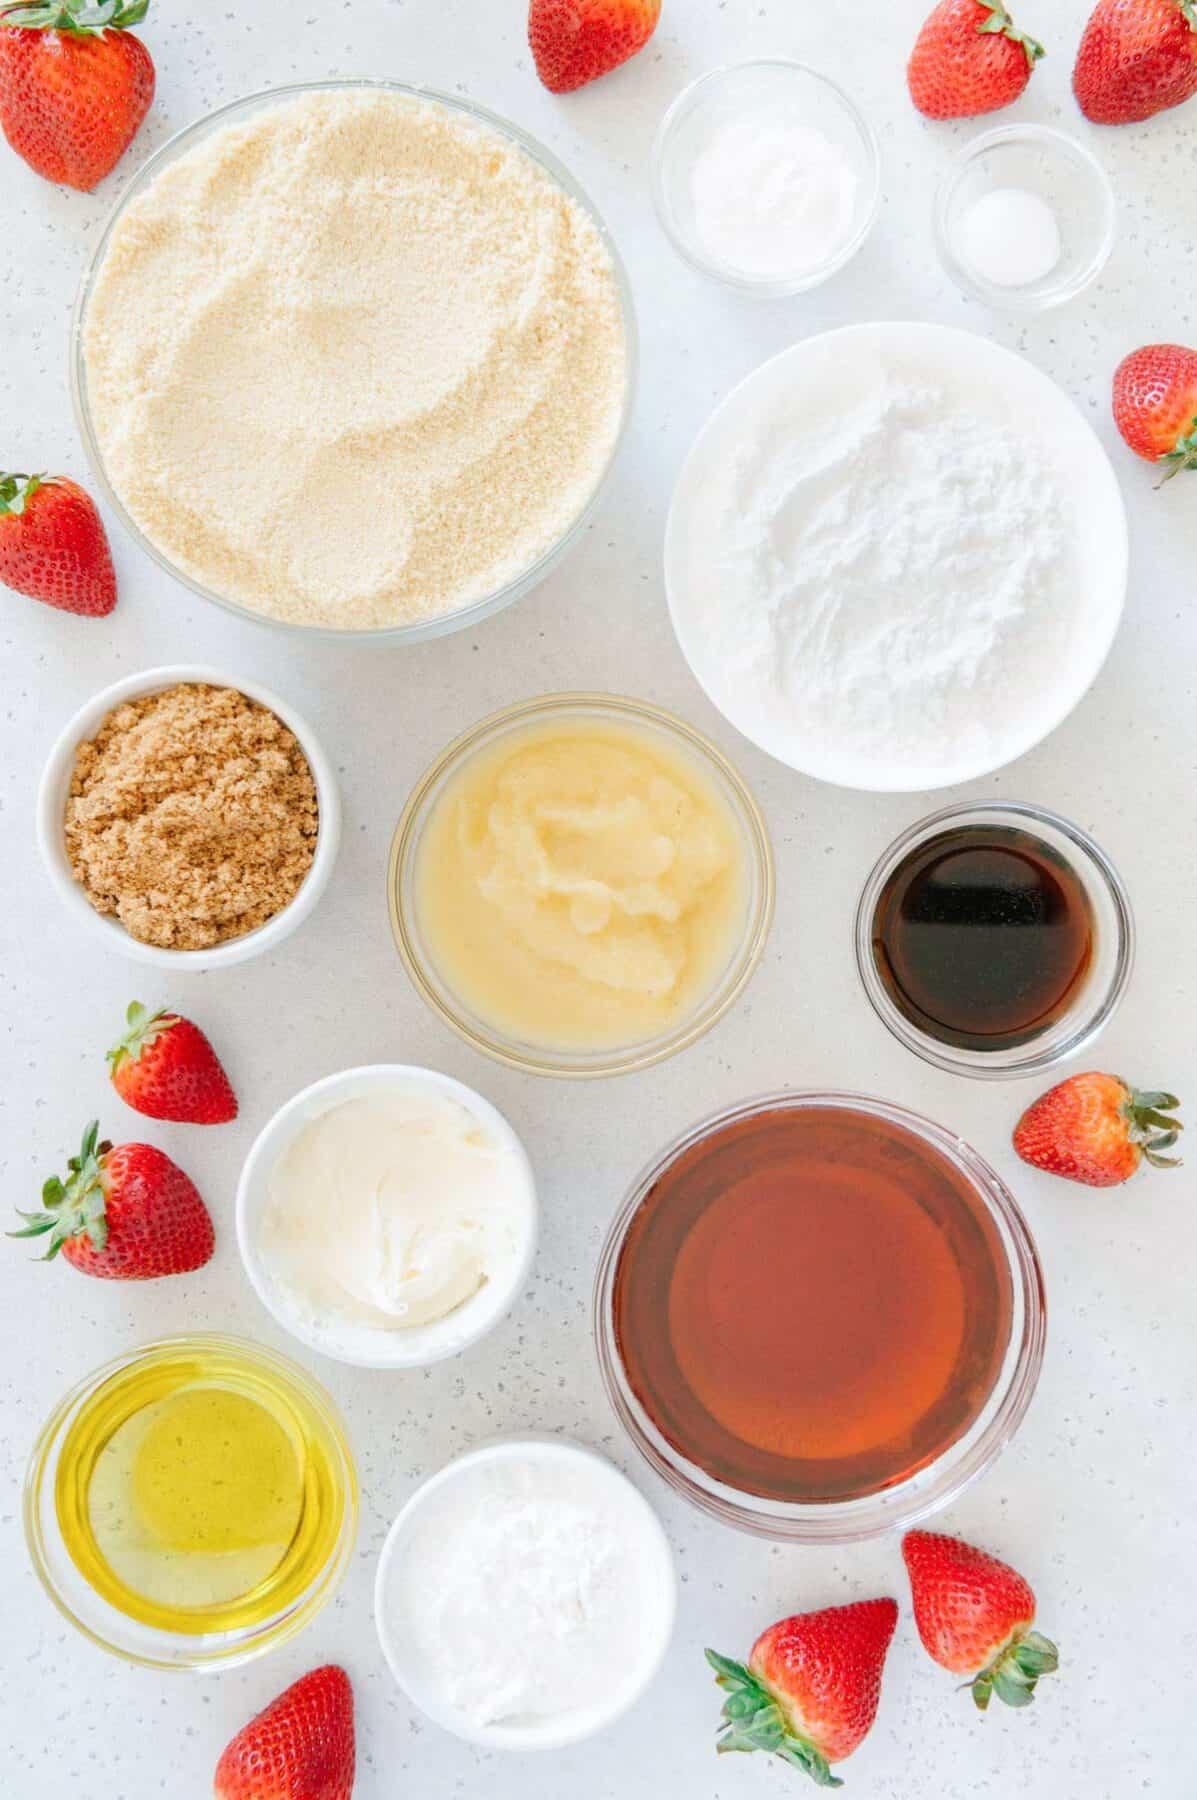 Vegan and Paleo Strawberry Shortcake Ingredients